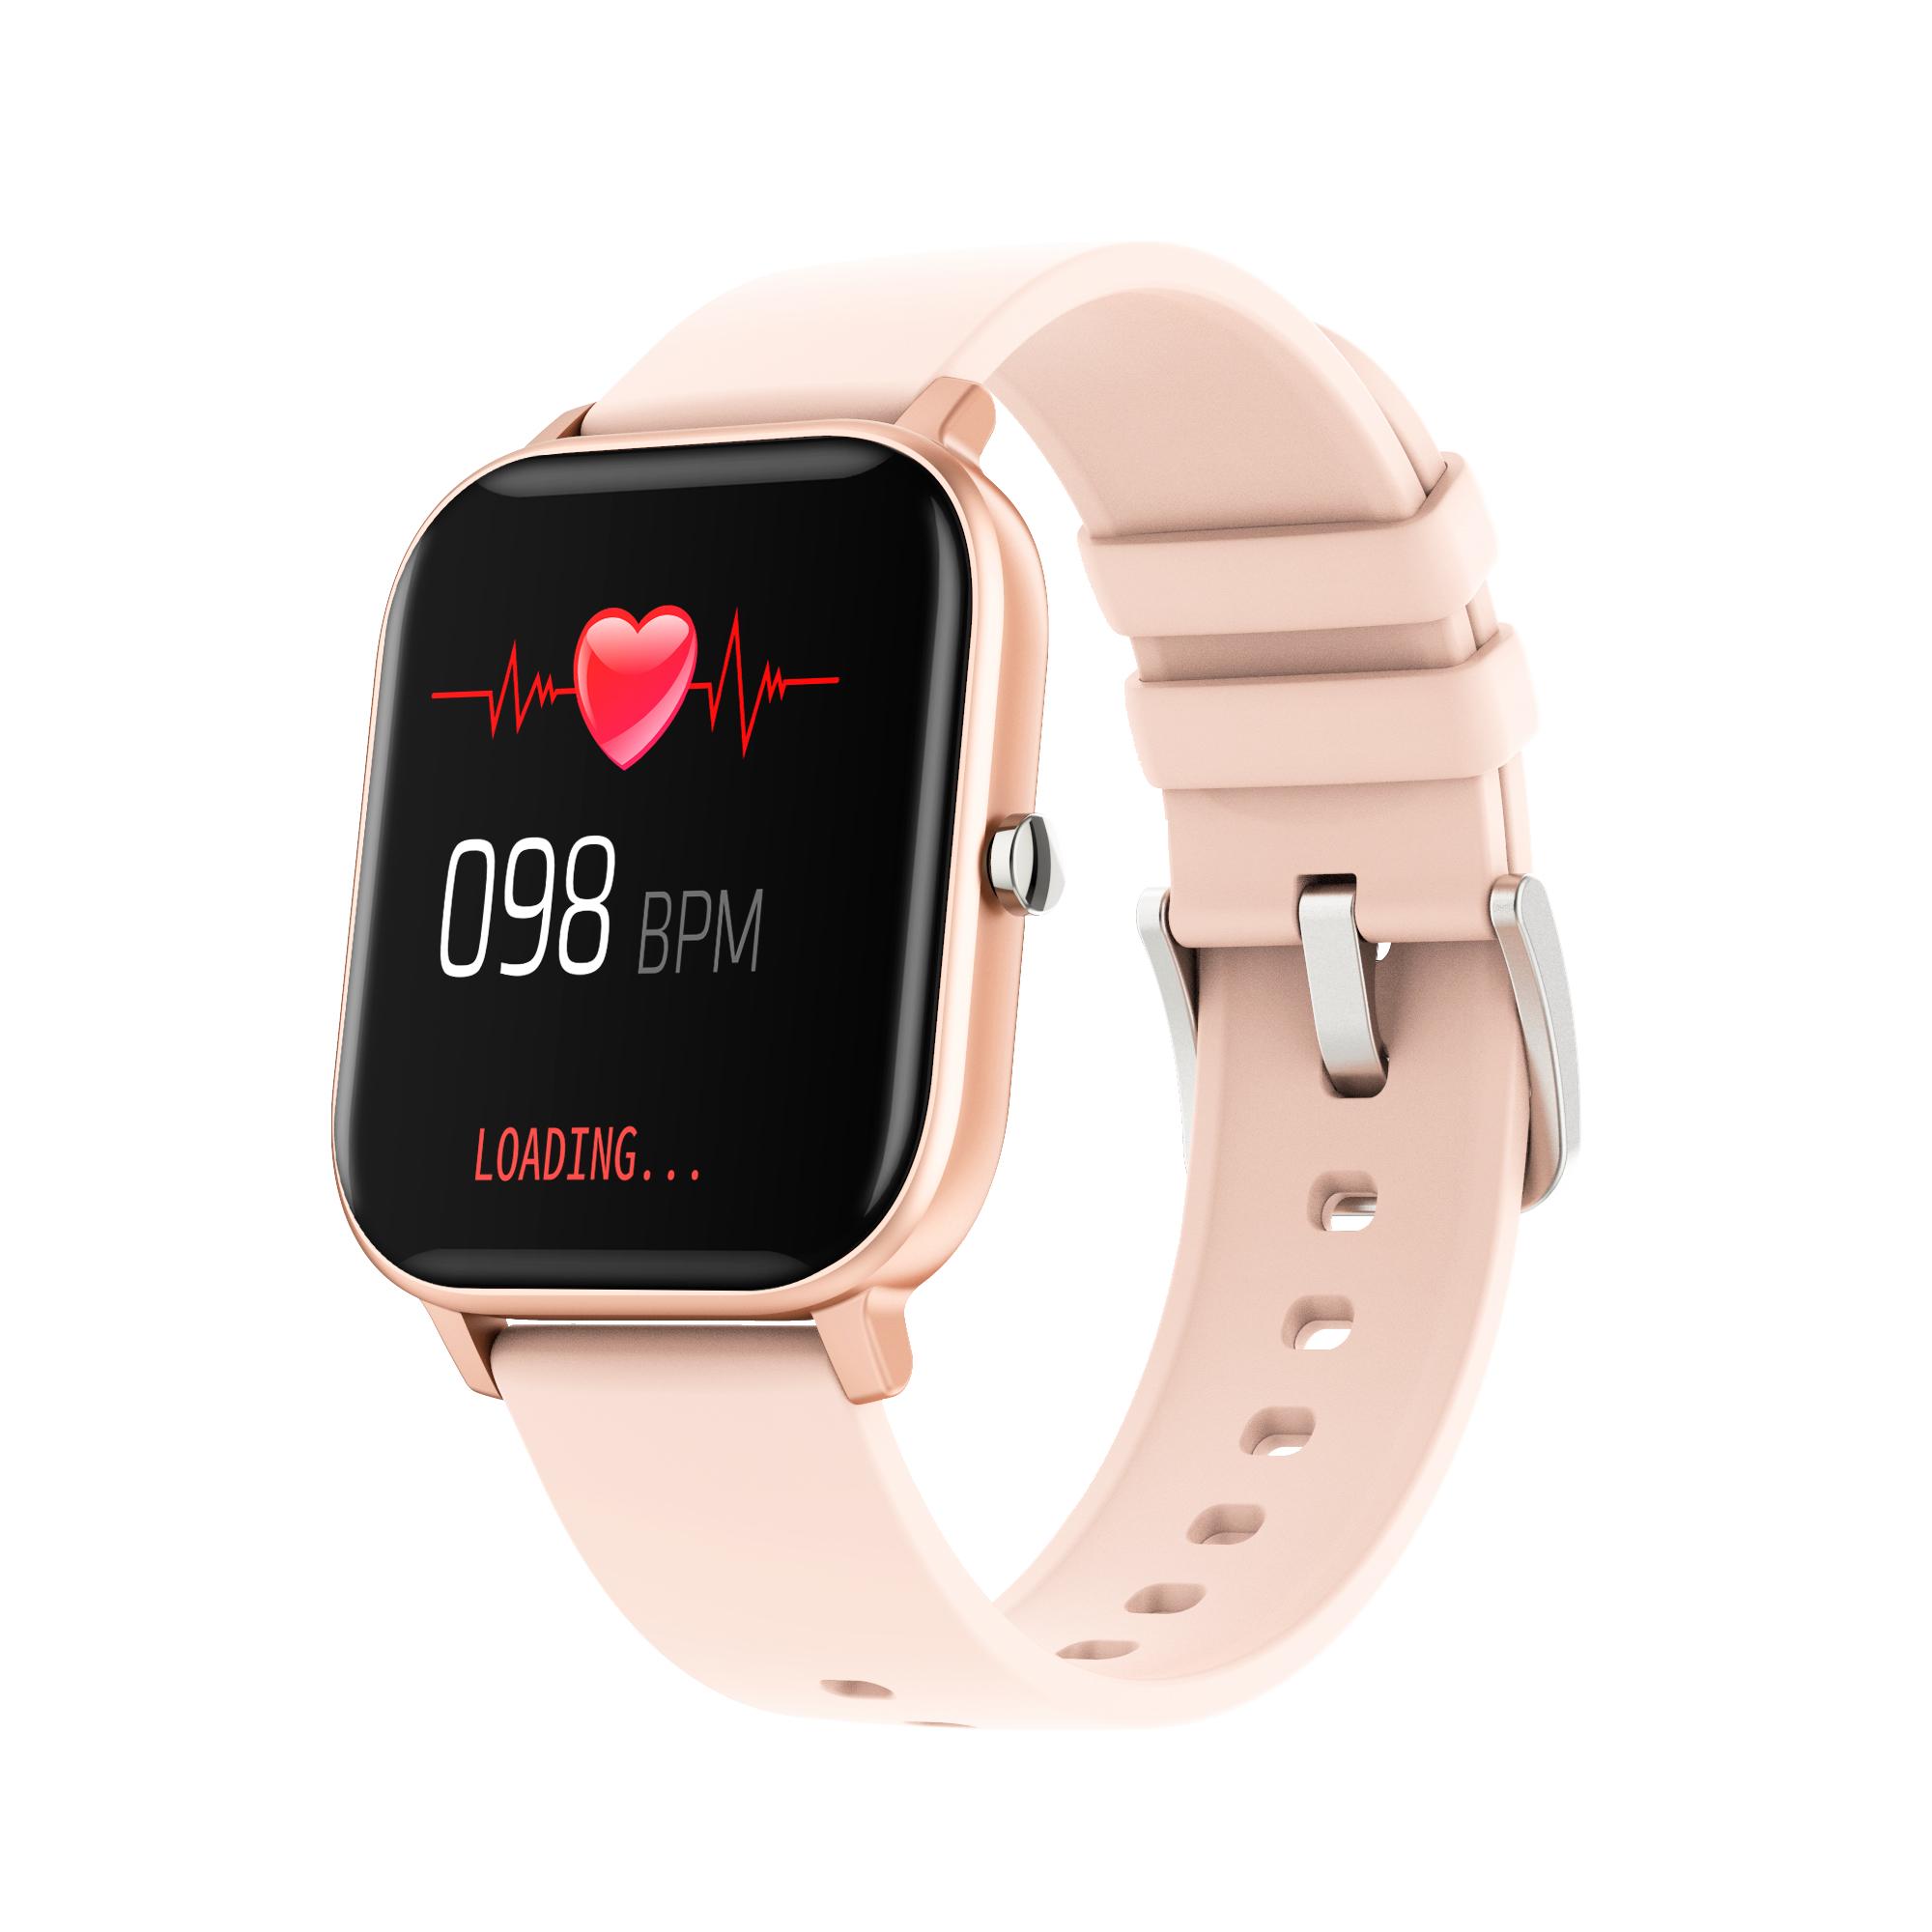 Fire-Boltt smartwatch,Amazon's